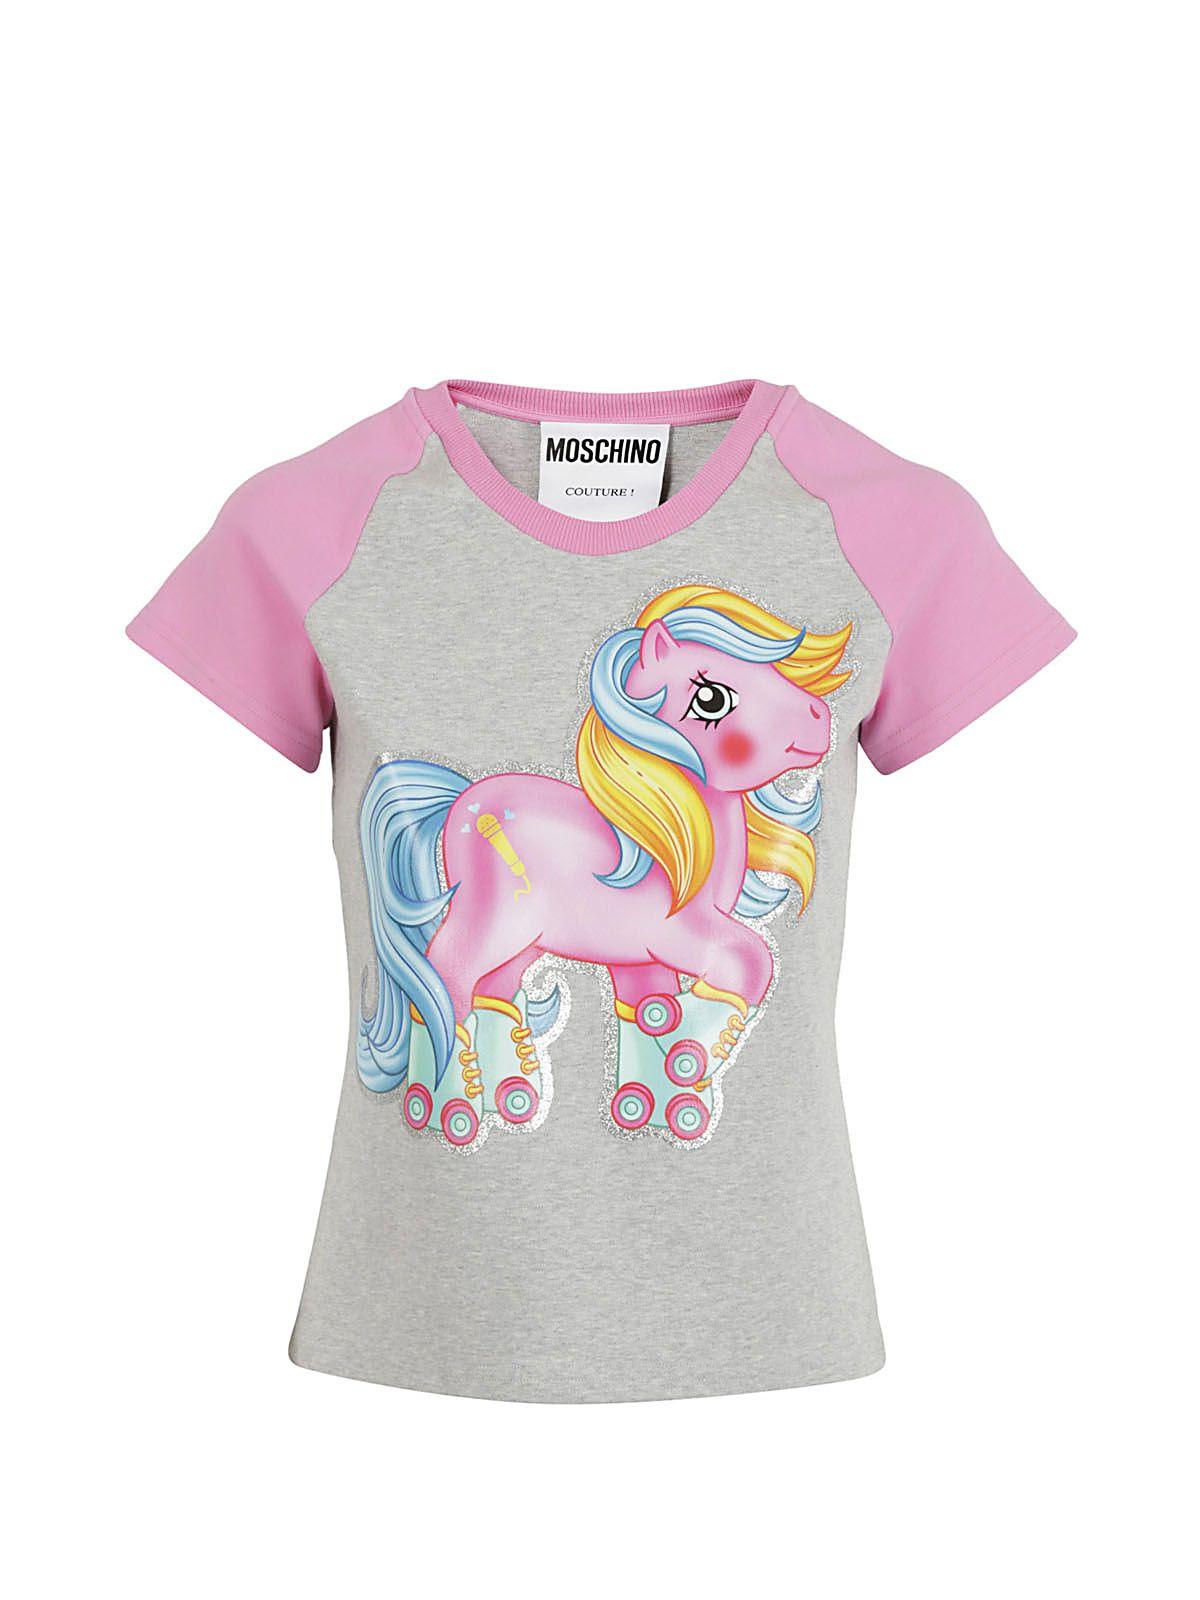 Moschino My Little Pony Printed T-shirt